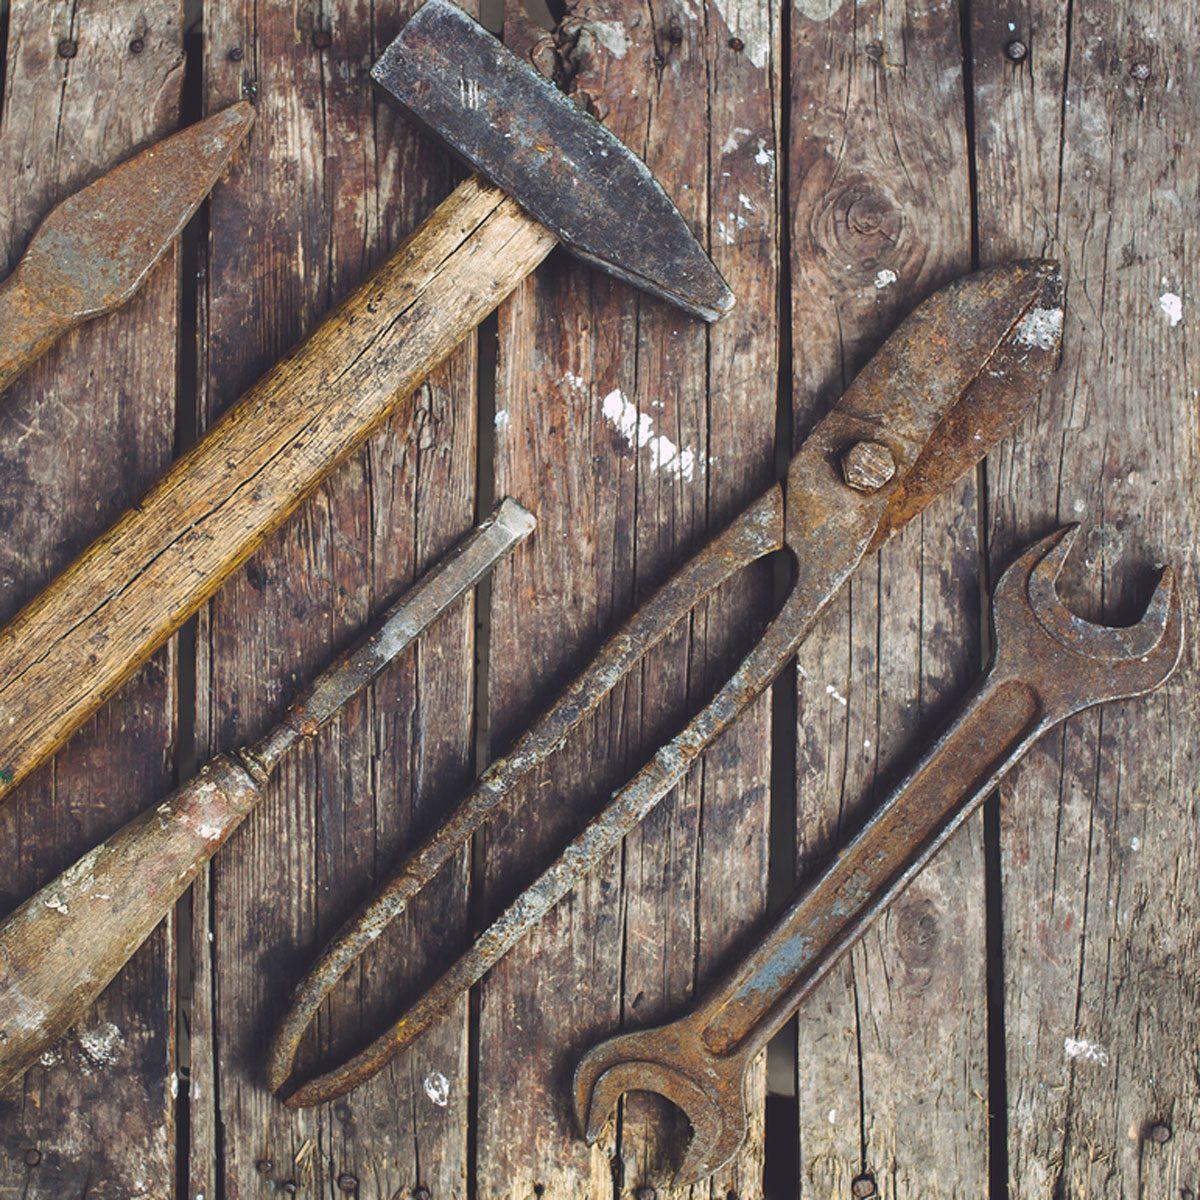 Clean rusty tools